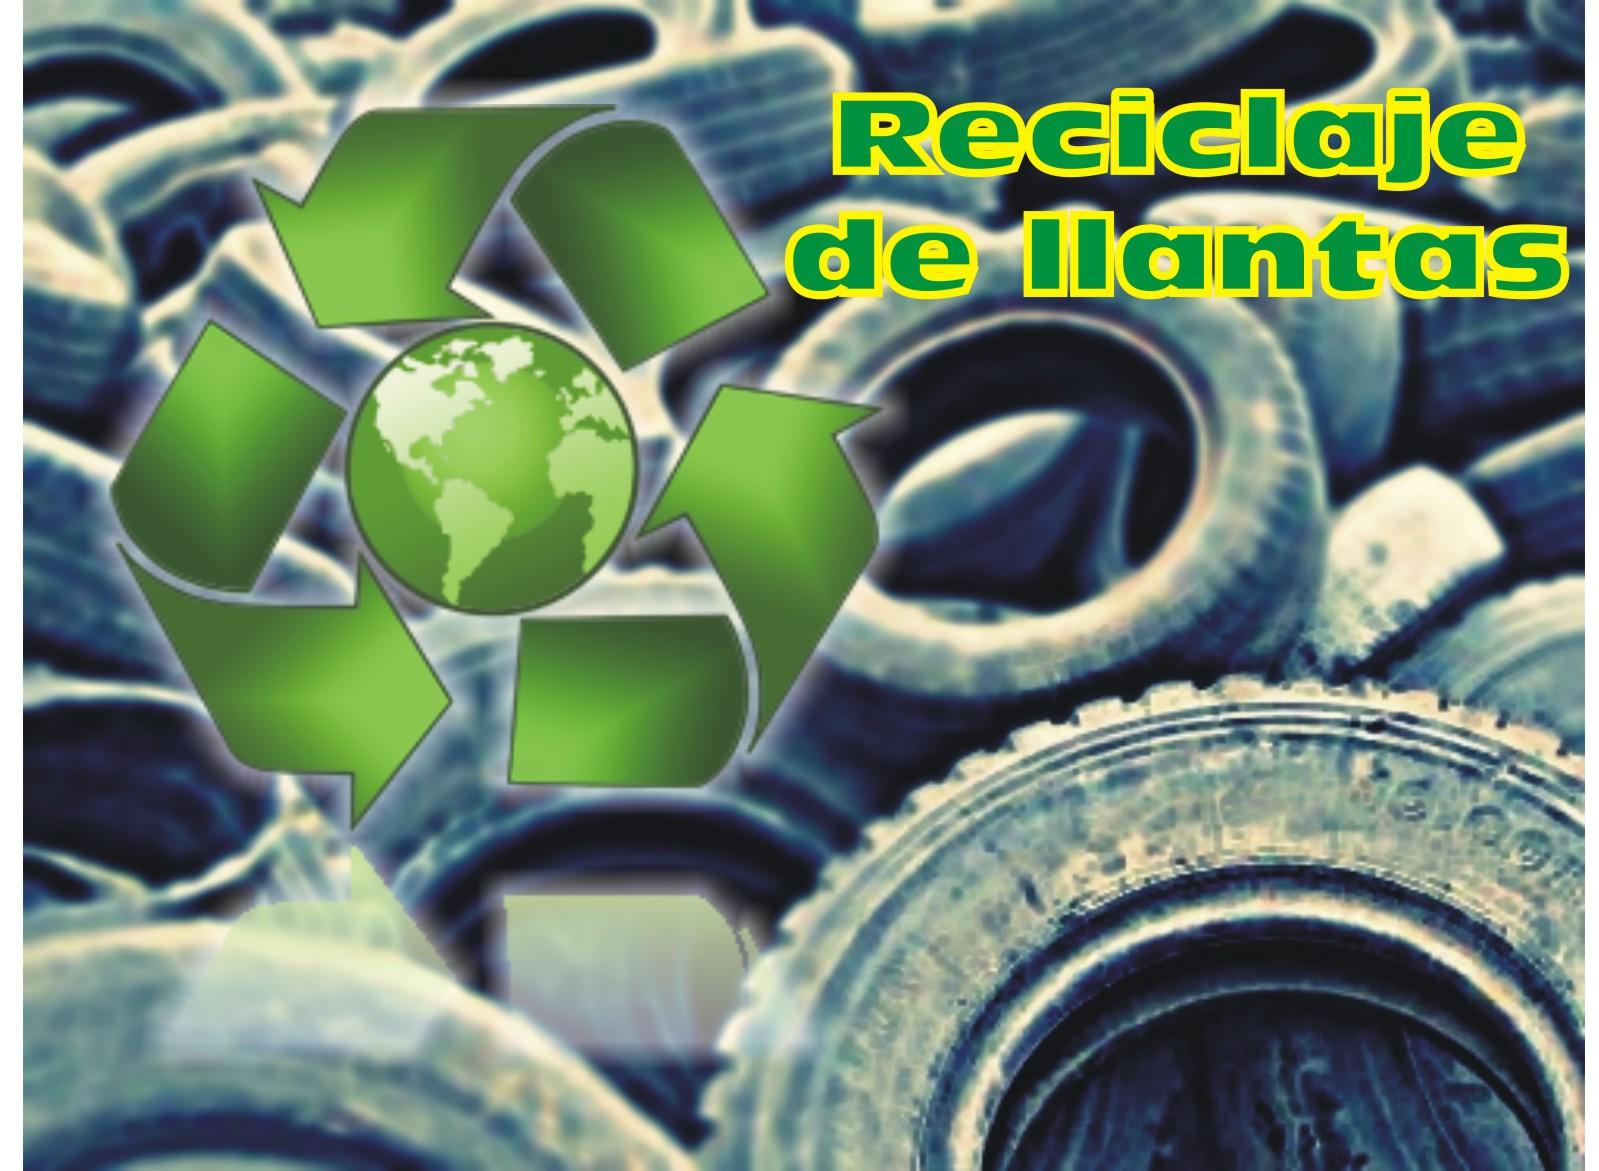 reciclaje reciclaje de llantas reciclaje de llantas un